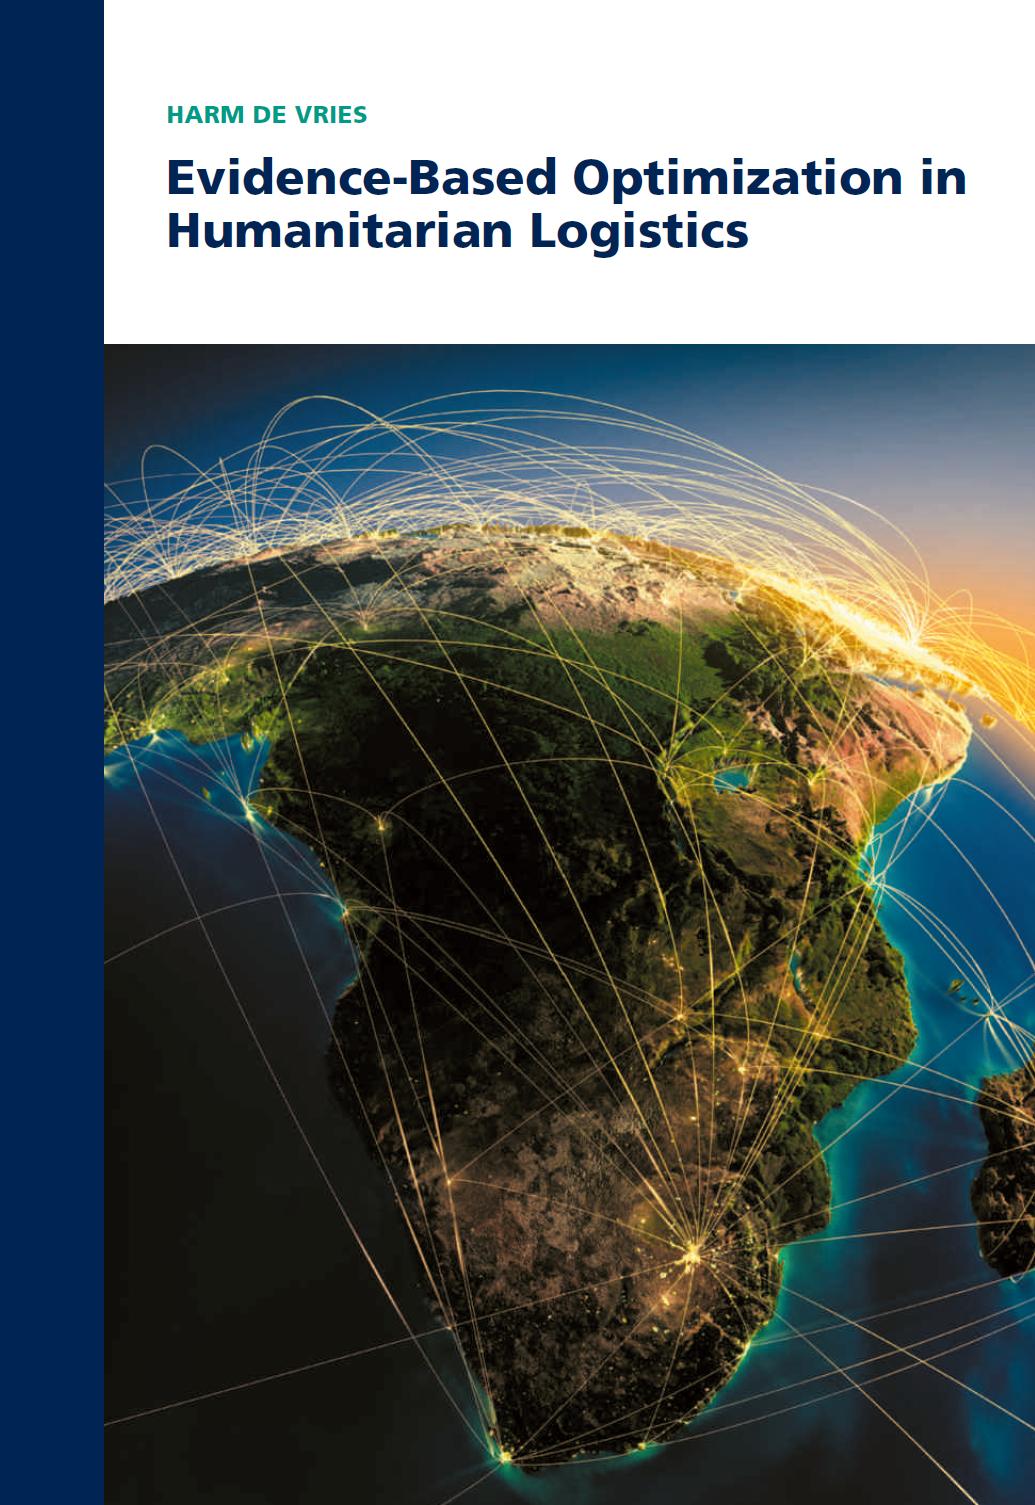 Evidence-Based Optimization in Humanitarian Logistics